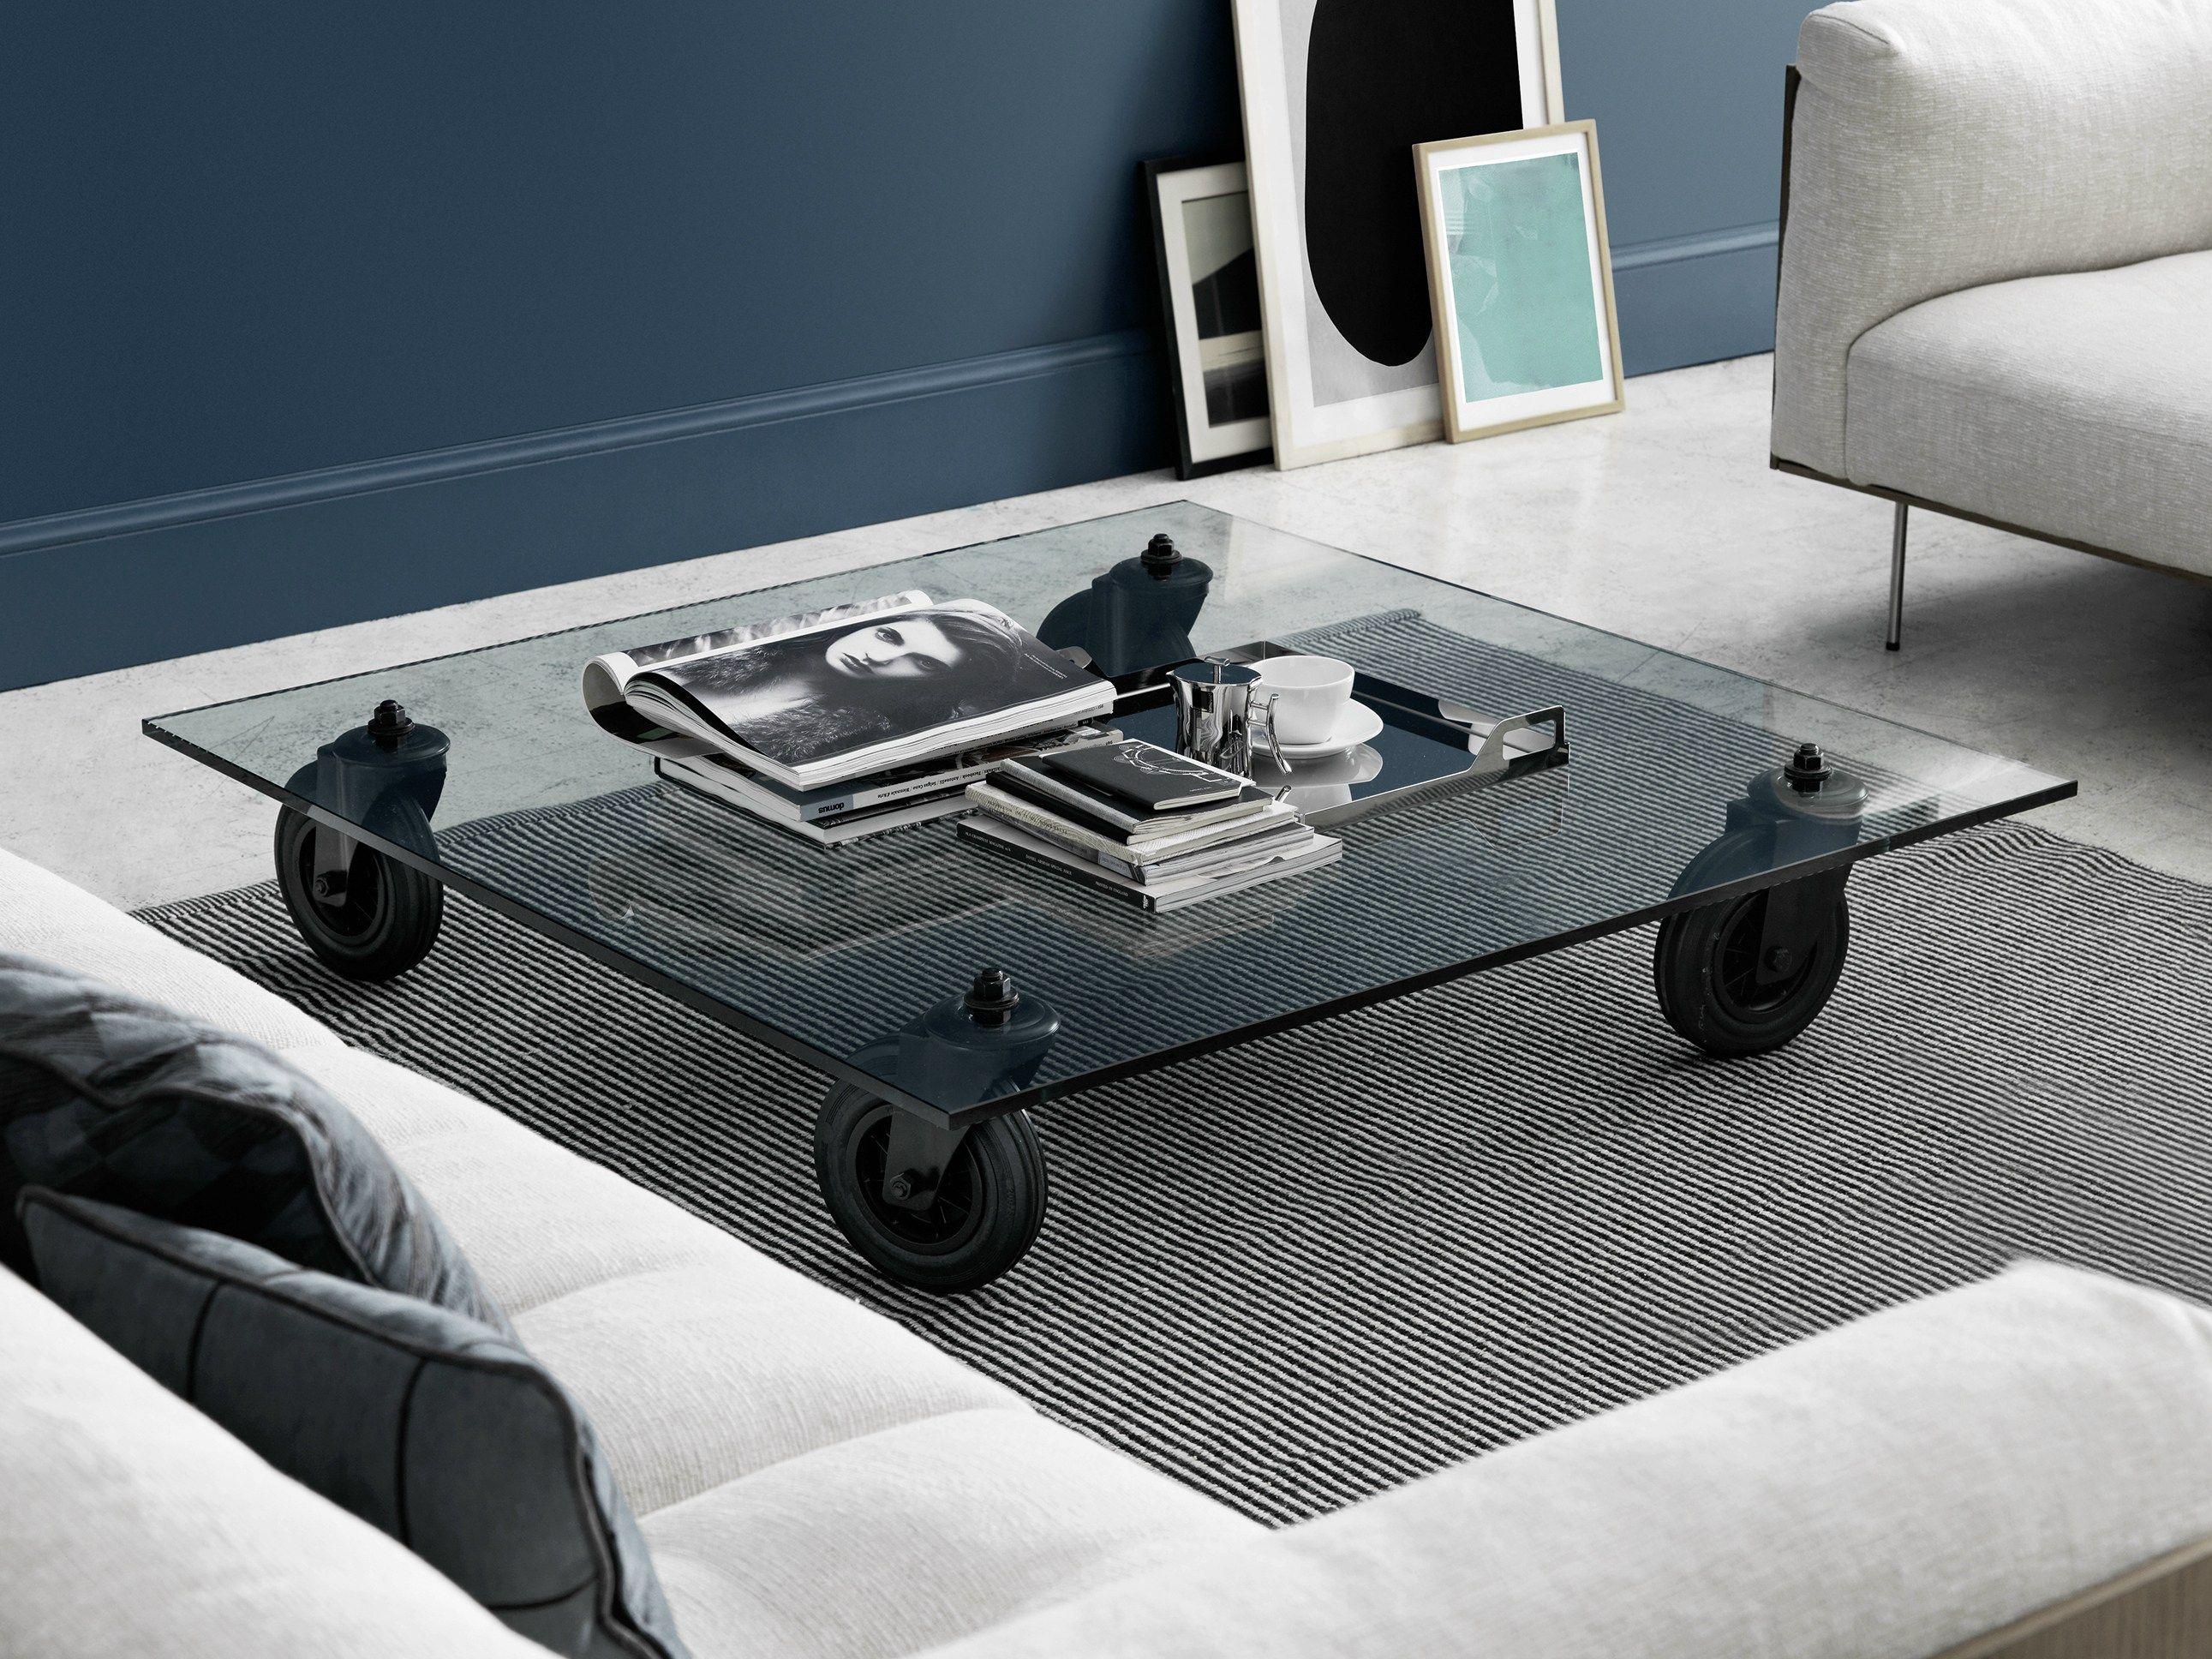 table basse carr e en verre flott roulettes tavolo con. Black Bedroom Furniture Sets. Home Design Ideas